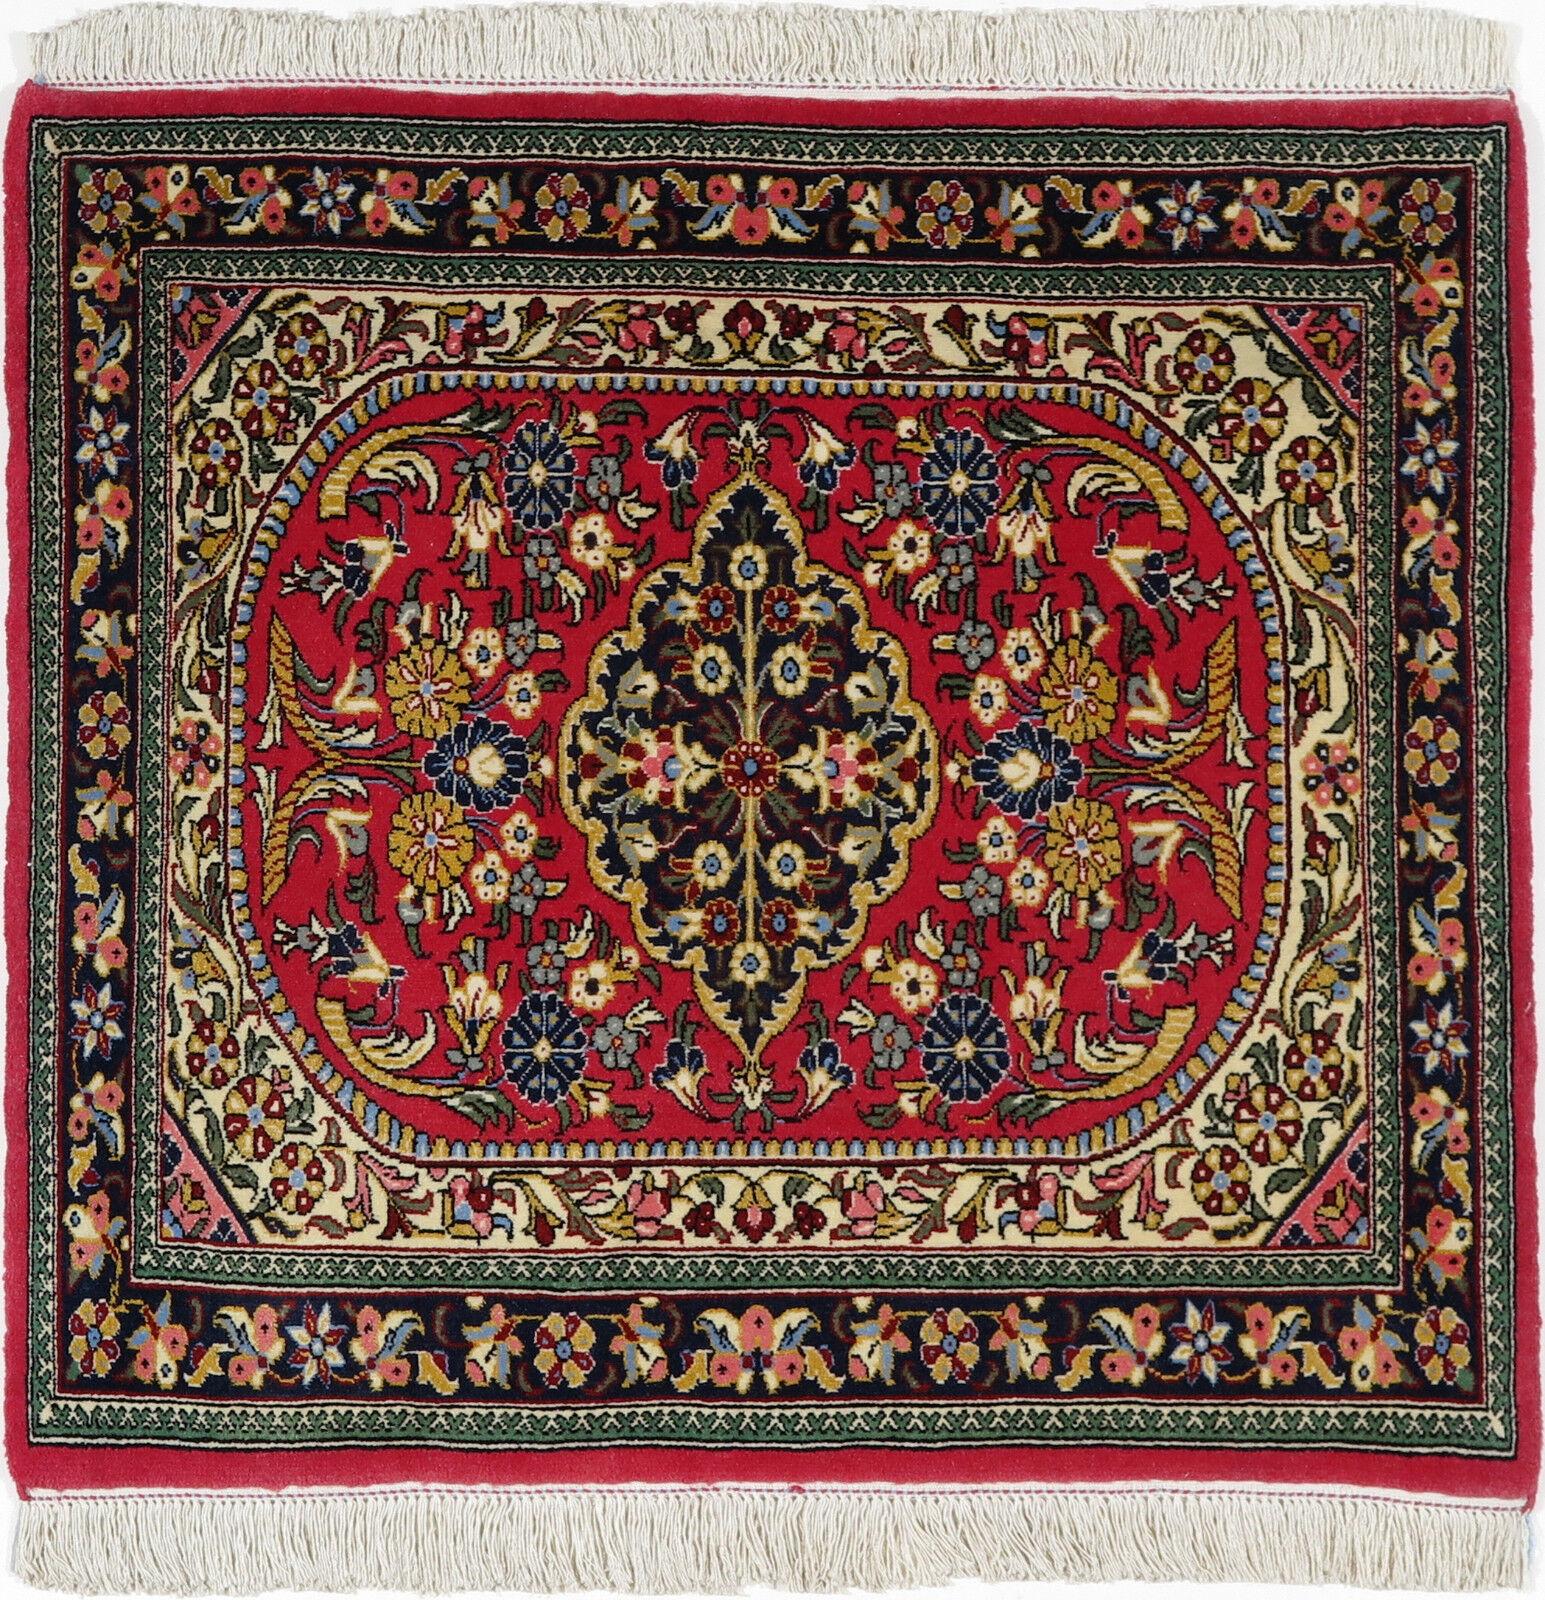 Ghom Teppich Orientteppich Rug Rug Rug Carpet Tapis Tapijt Tappeto Alfombra Art Kunst a5f87b